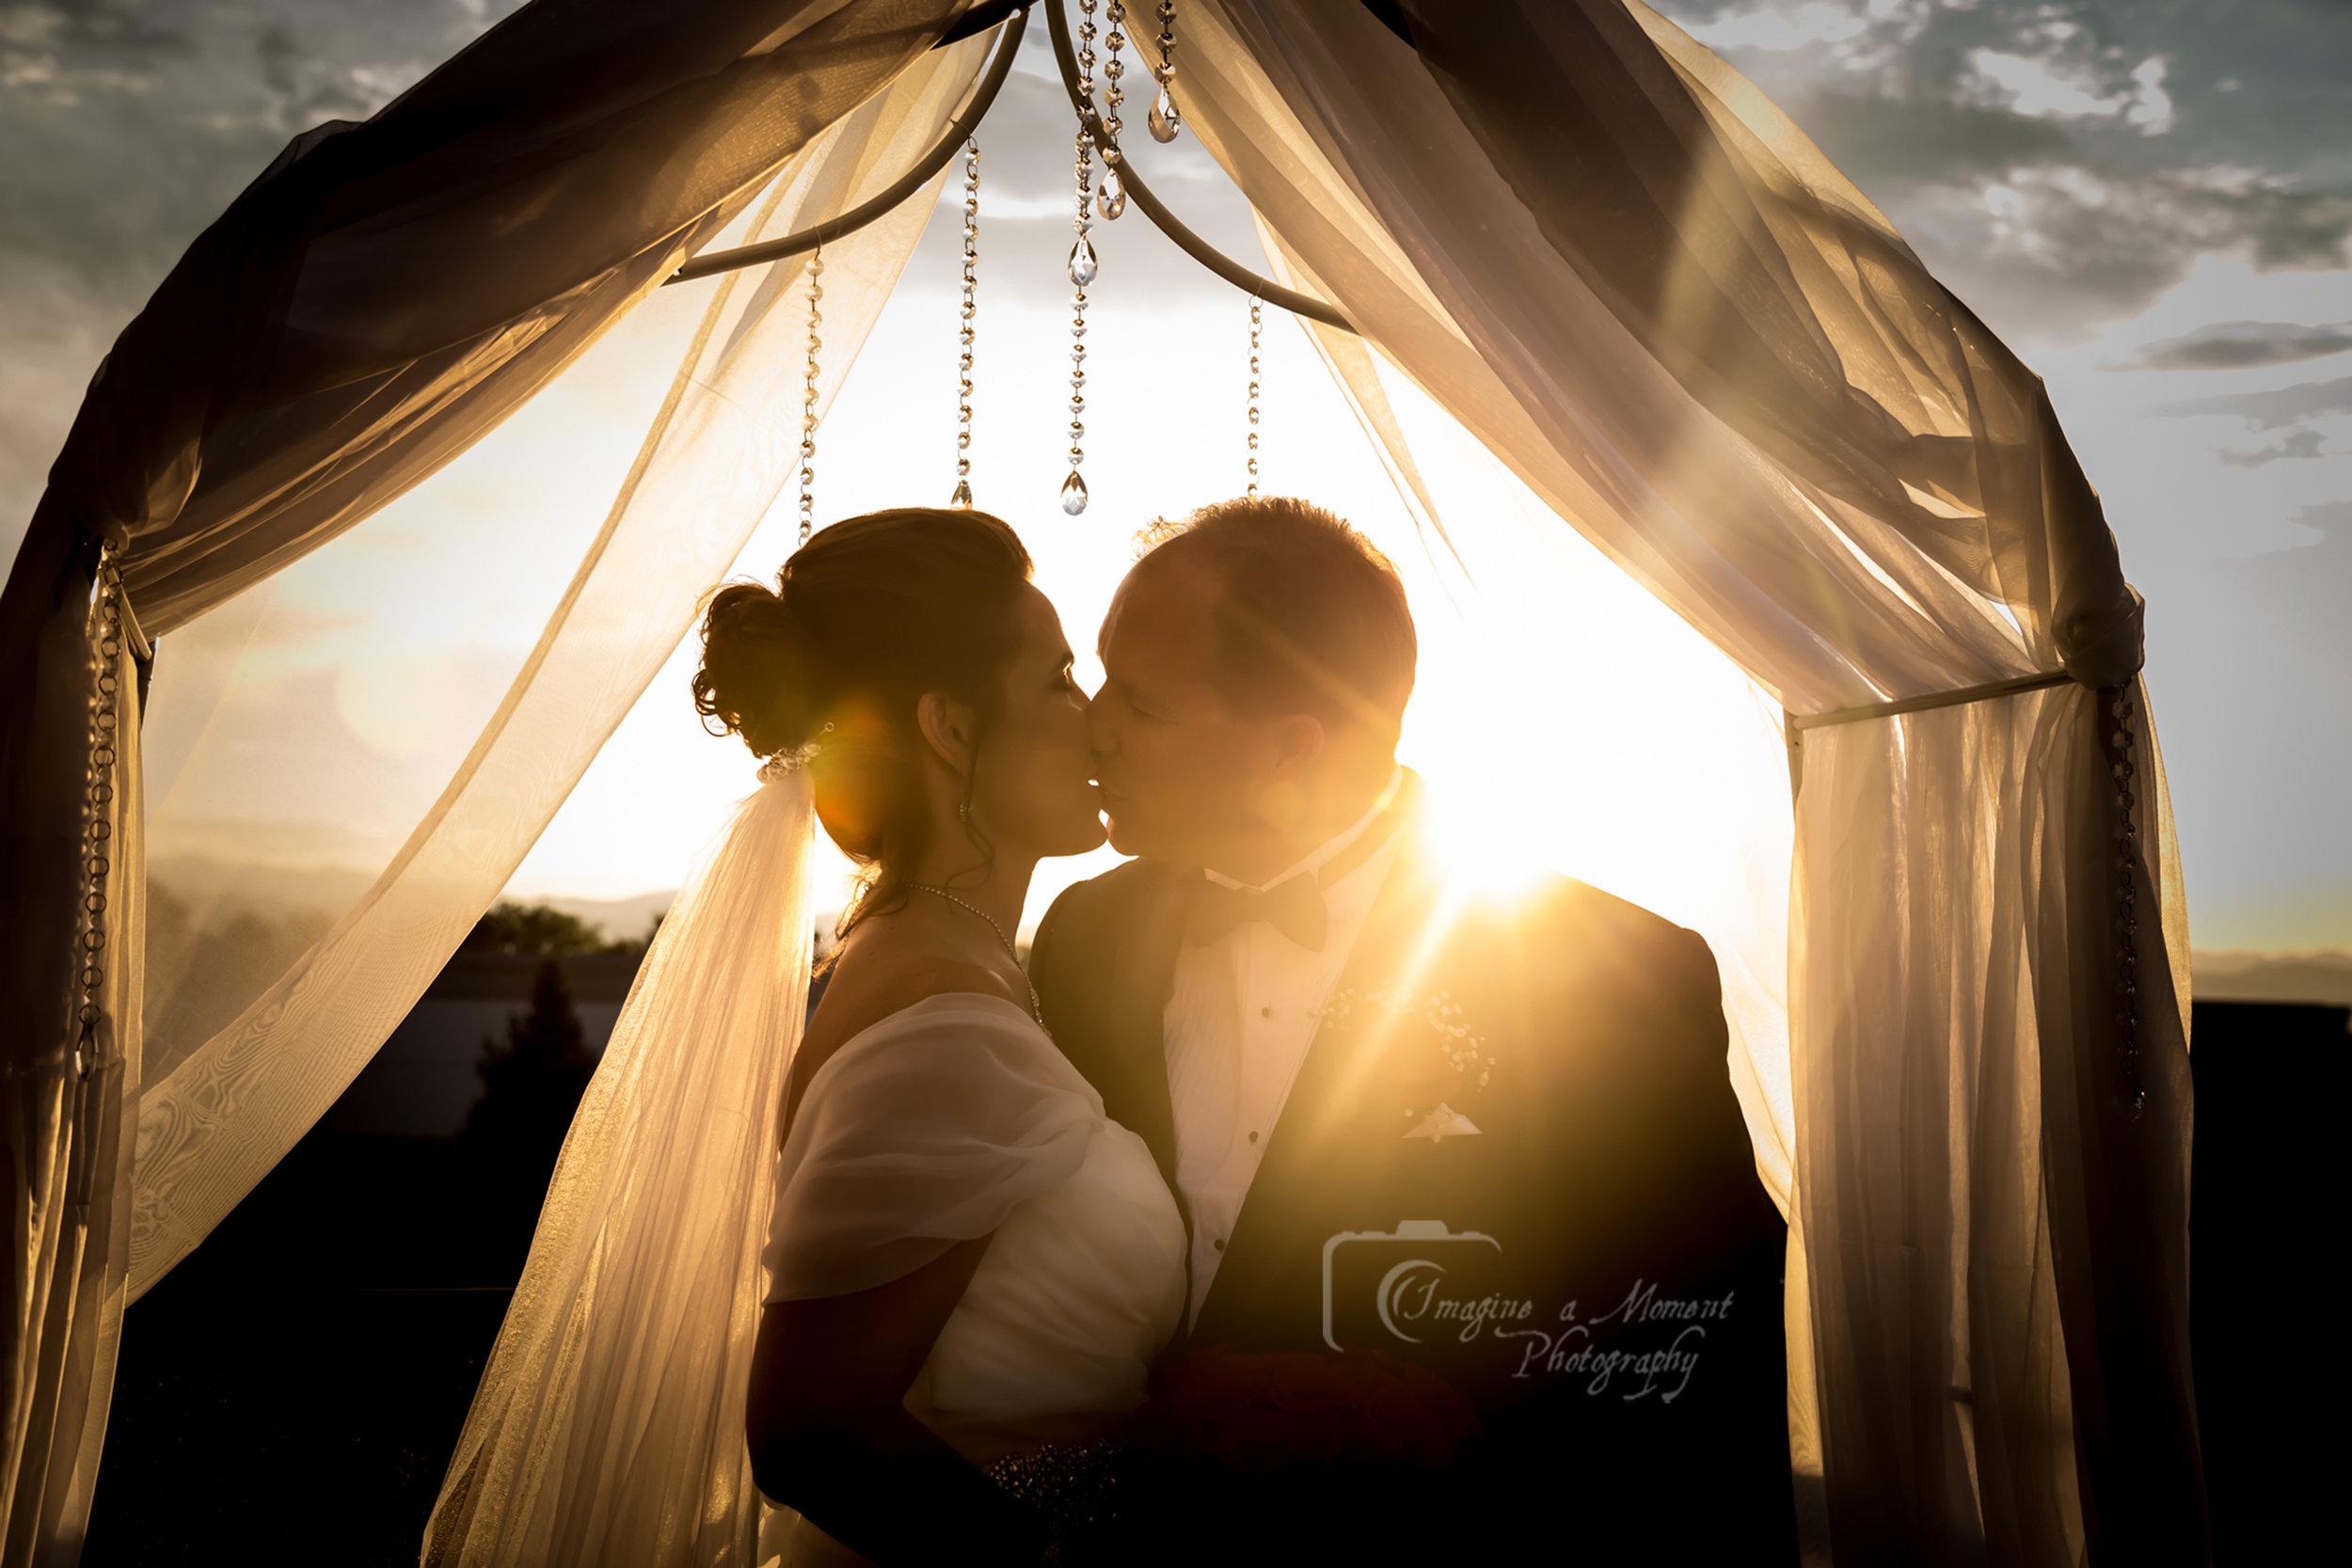 Miller Wedding 20175 WM.jpg